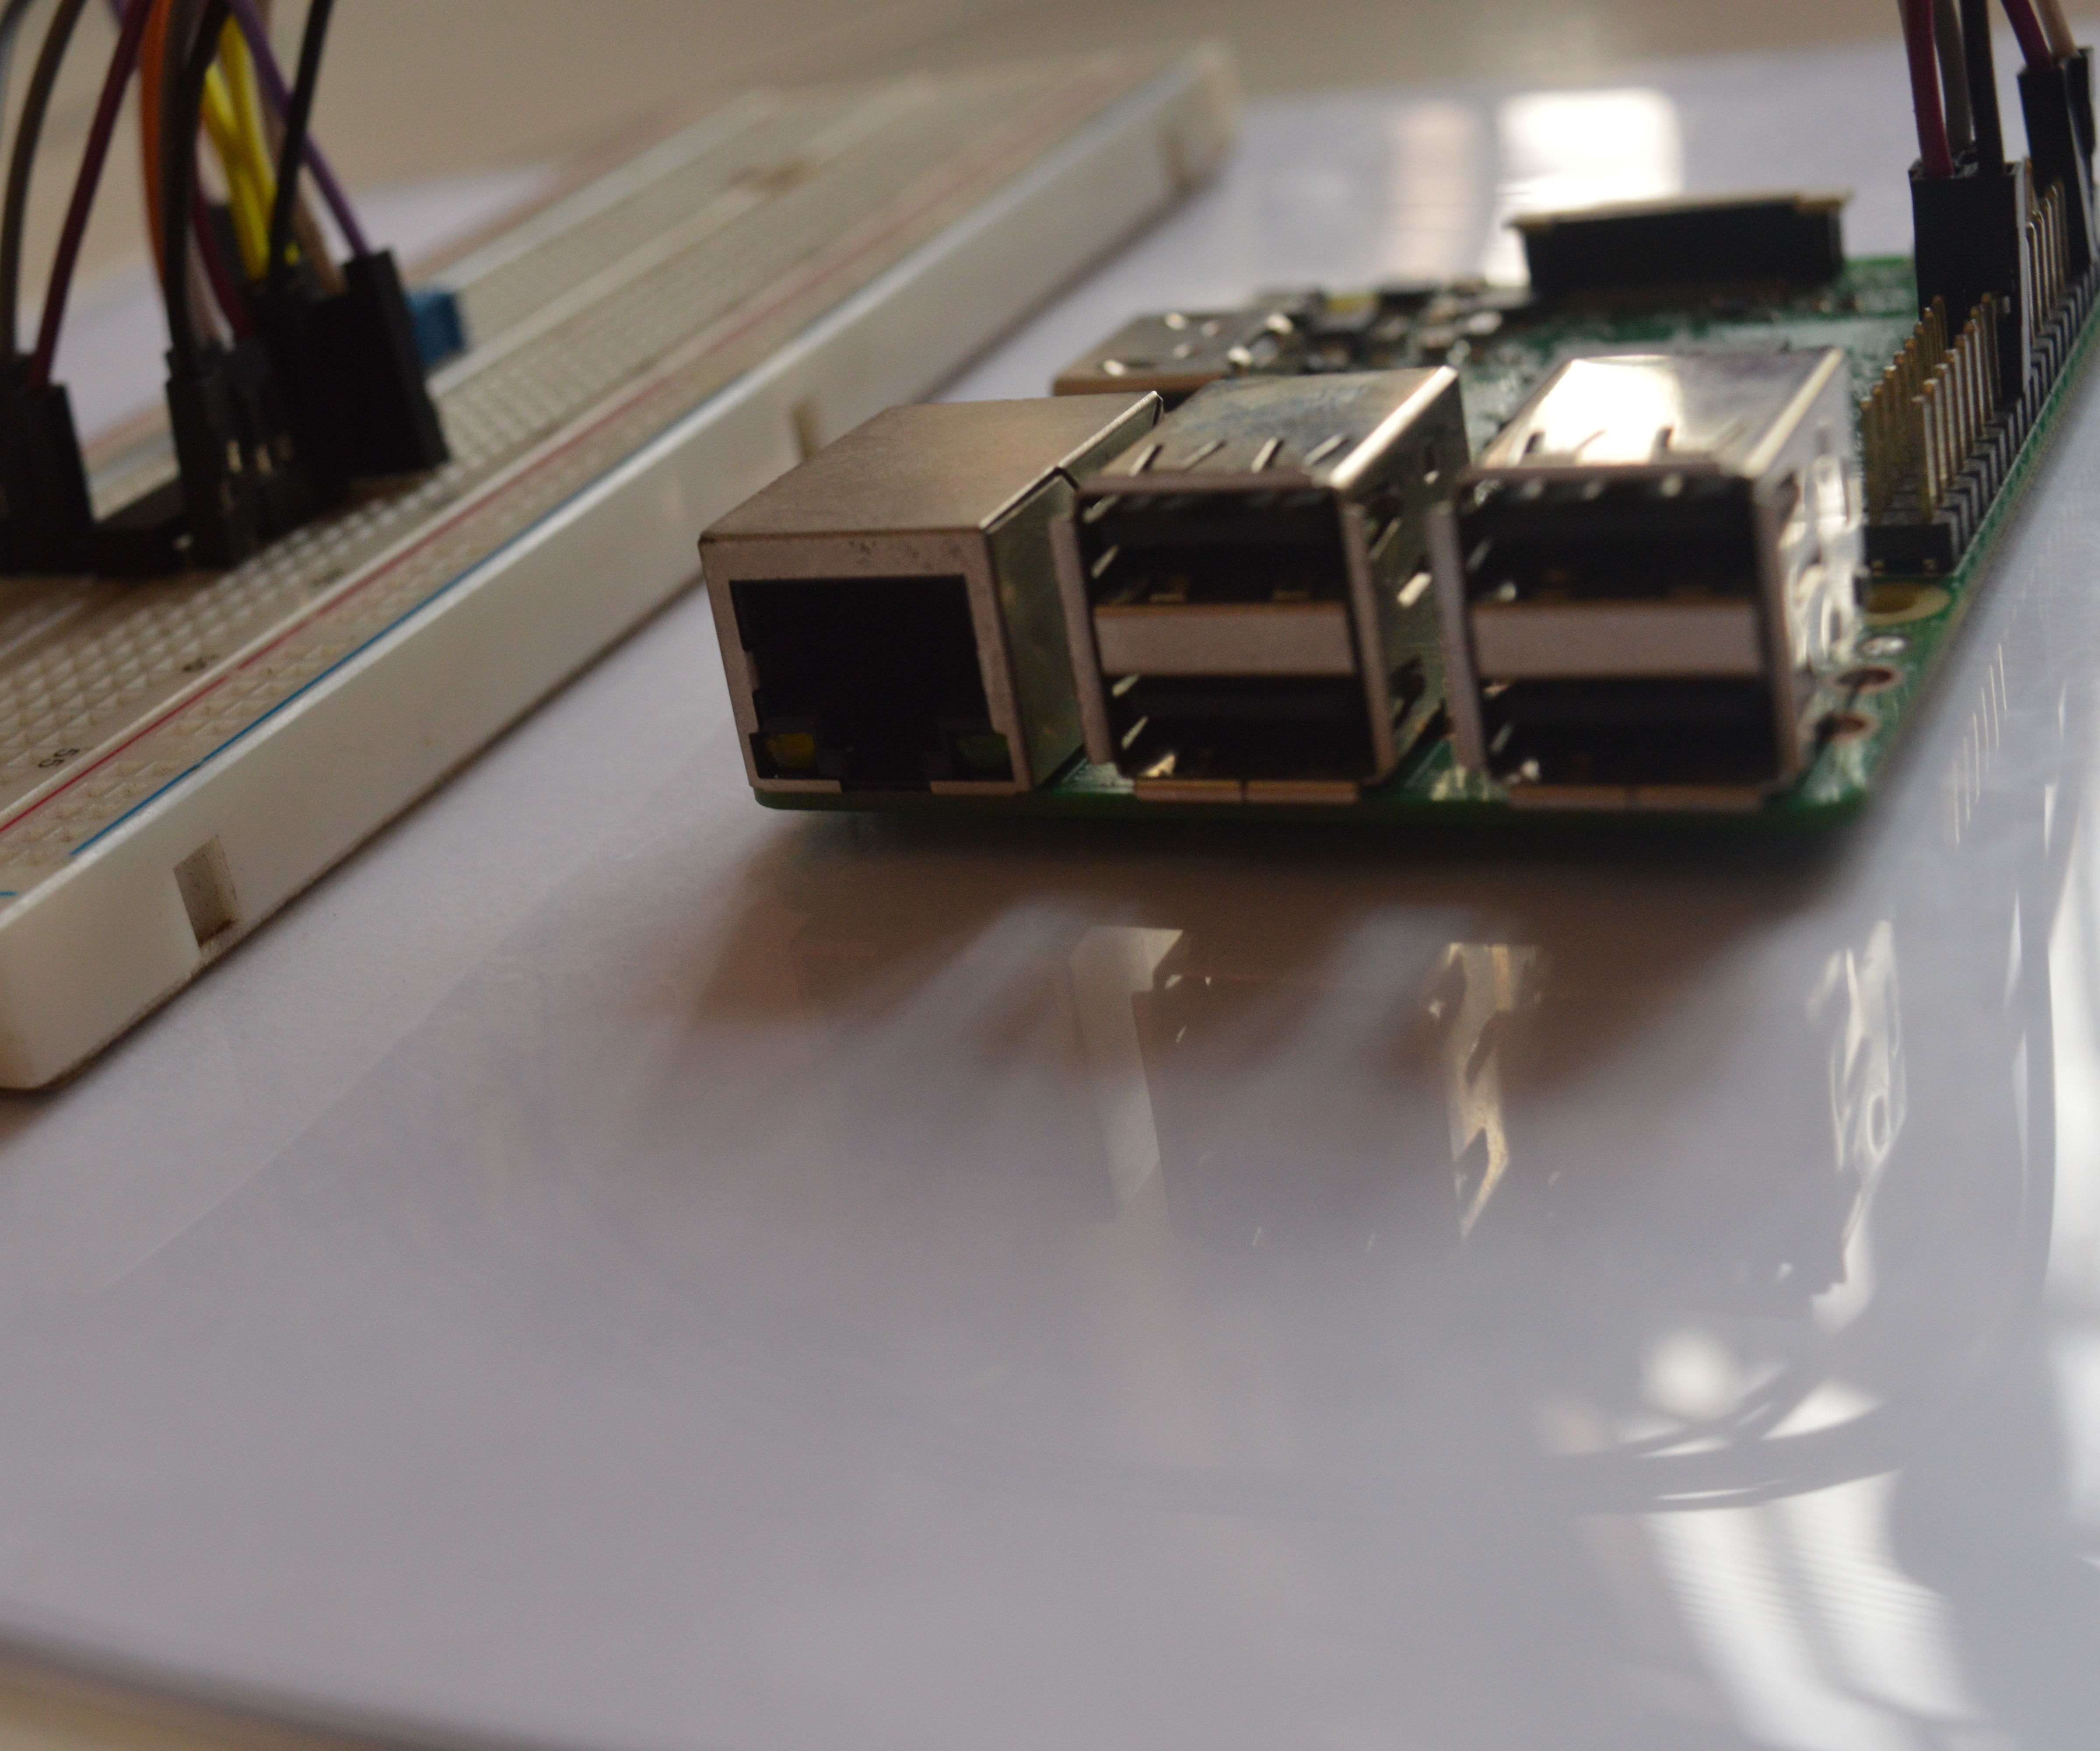 How to Take Analog Readings on the Raspberry Pi